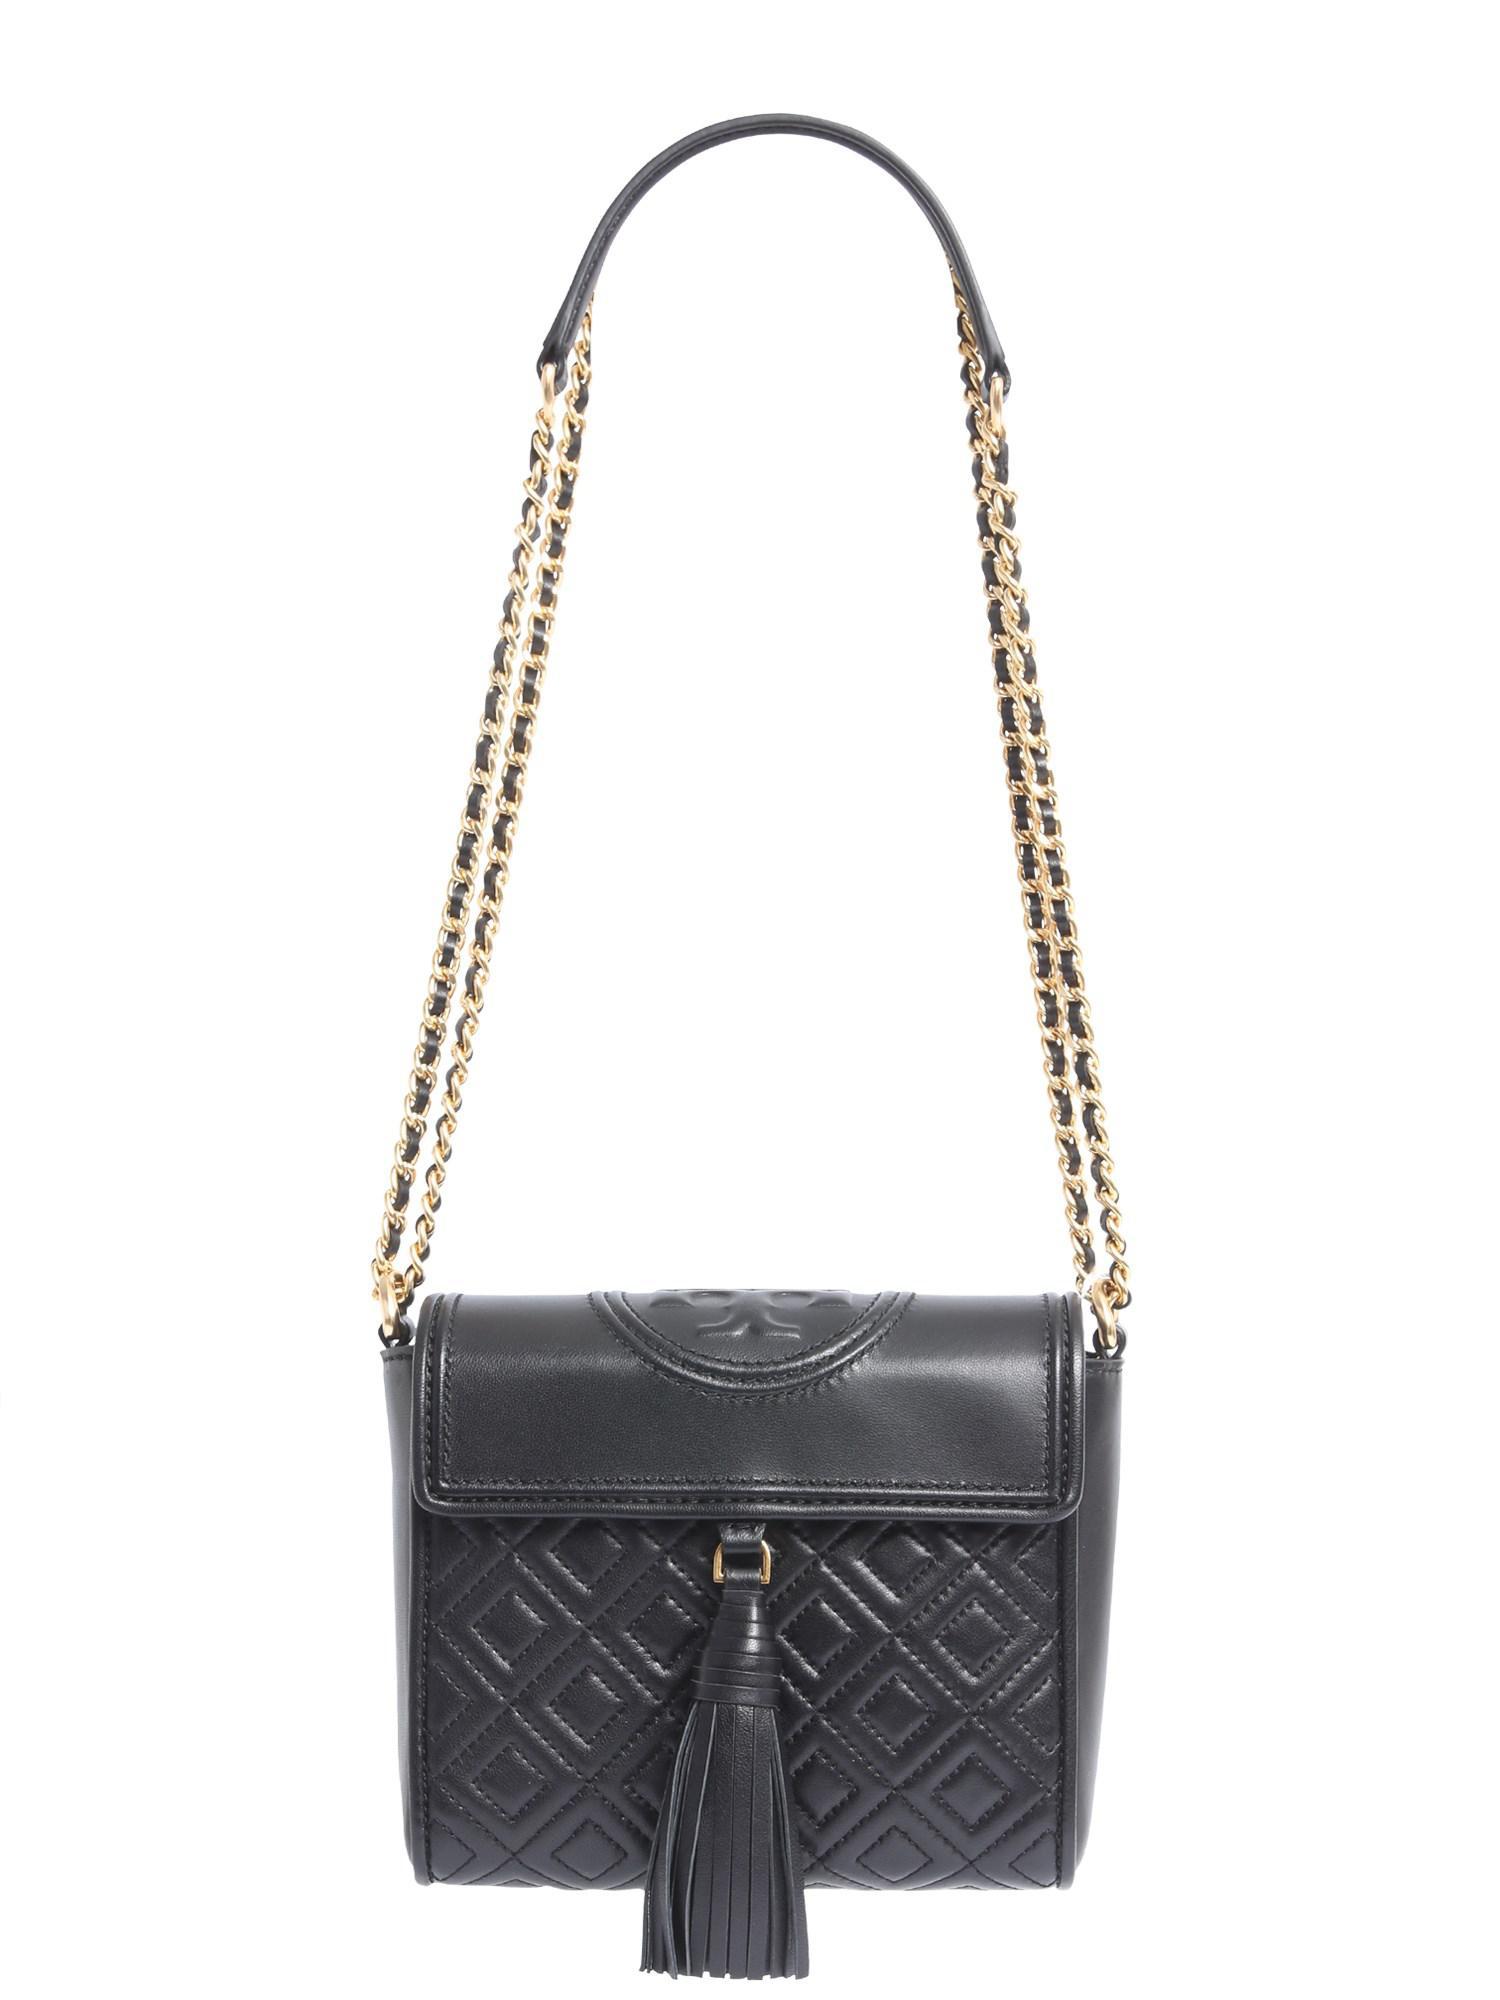 a650b48010f Tory Burch Fleming Crossbody Bag in Black - Save 11% - Lyst